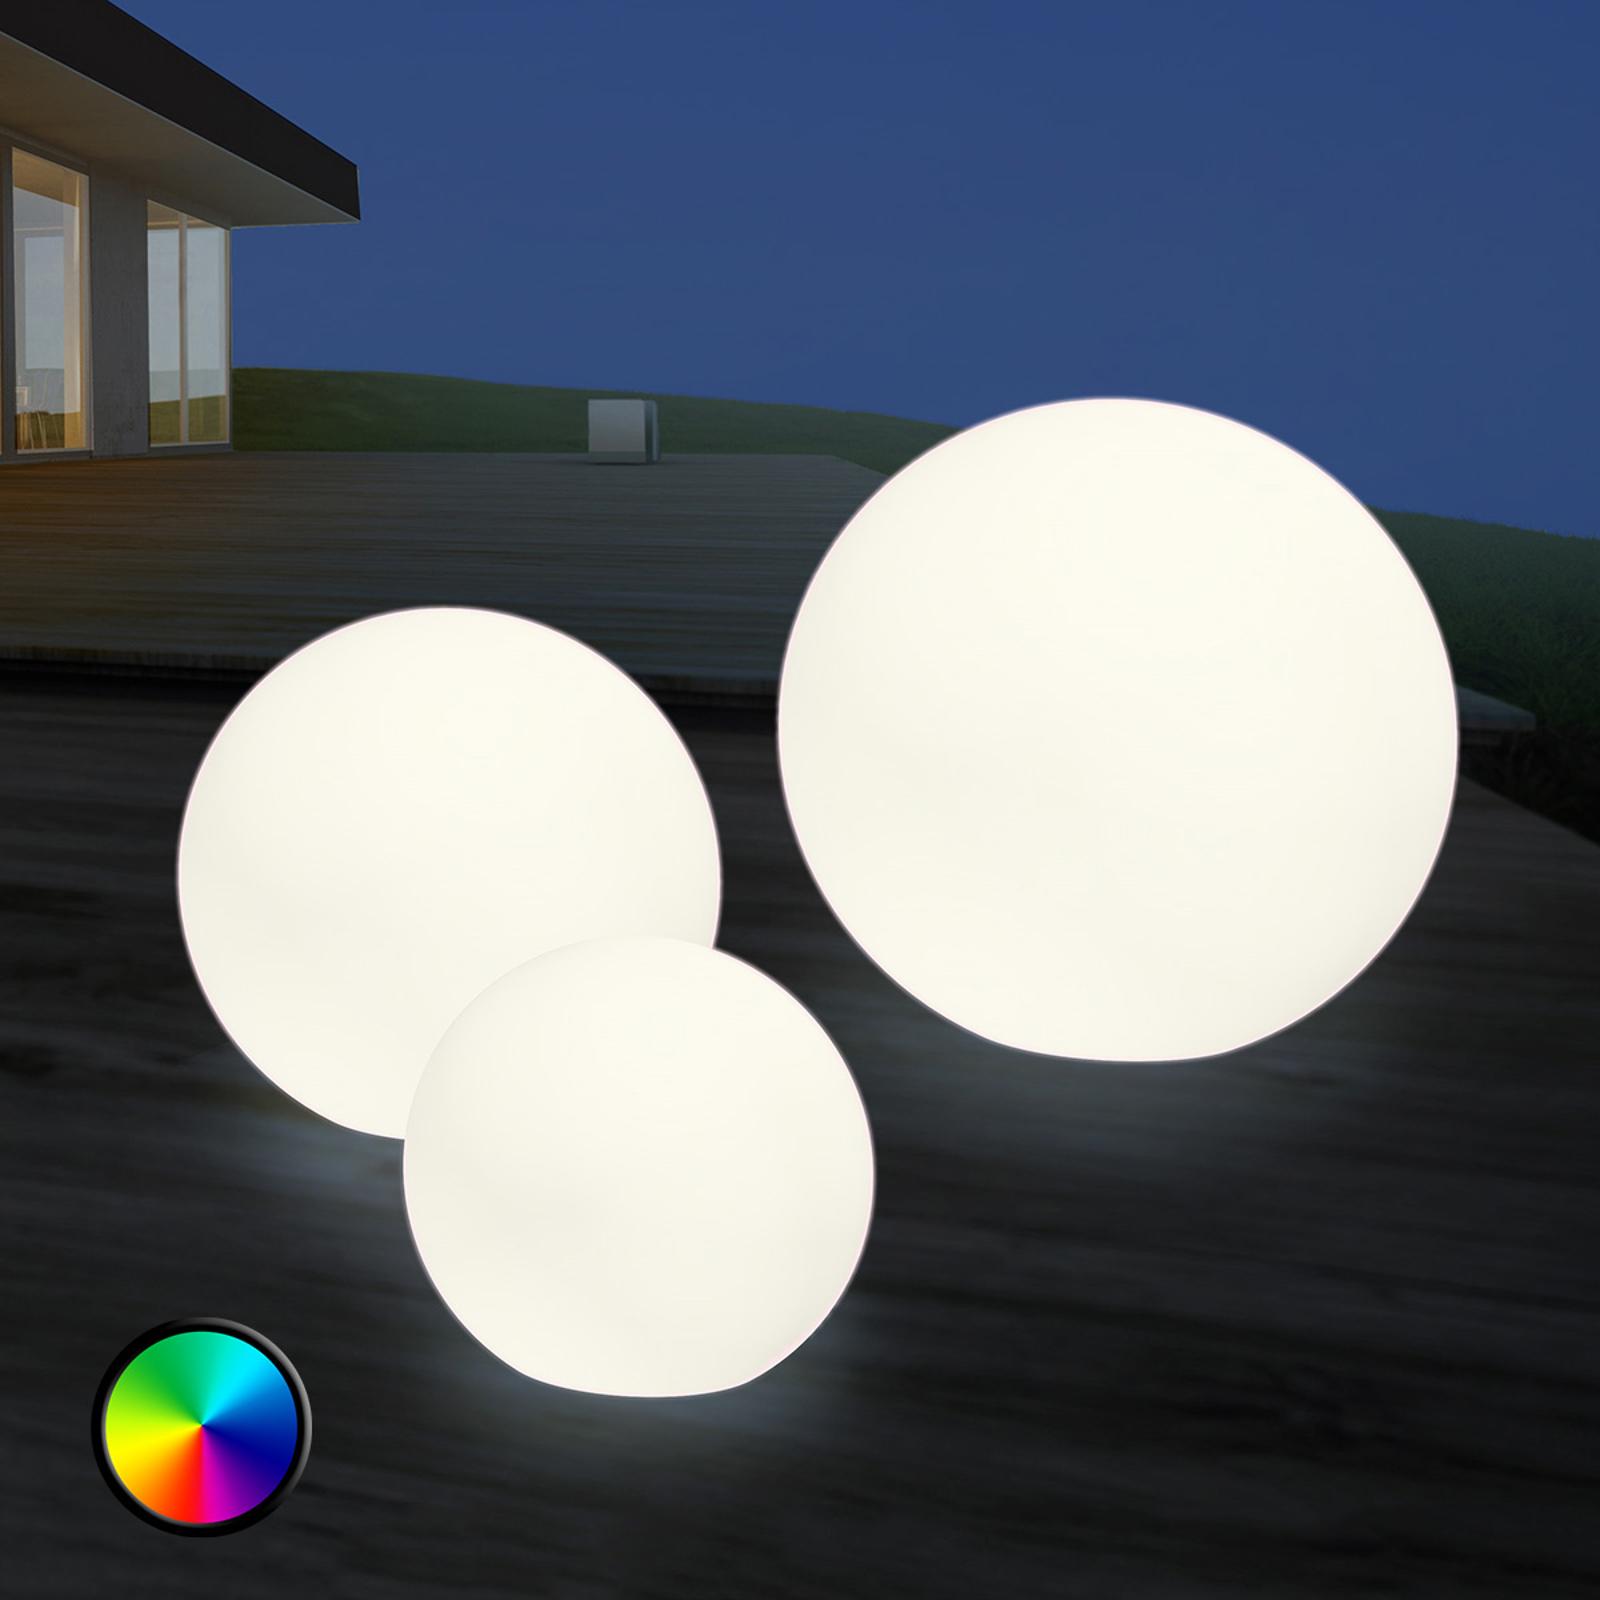 LED-Außendekorationsleuchte Shining Globe 30 cm